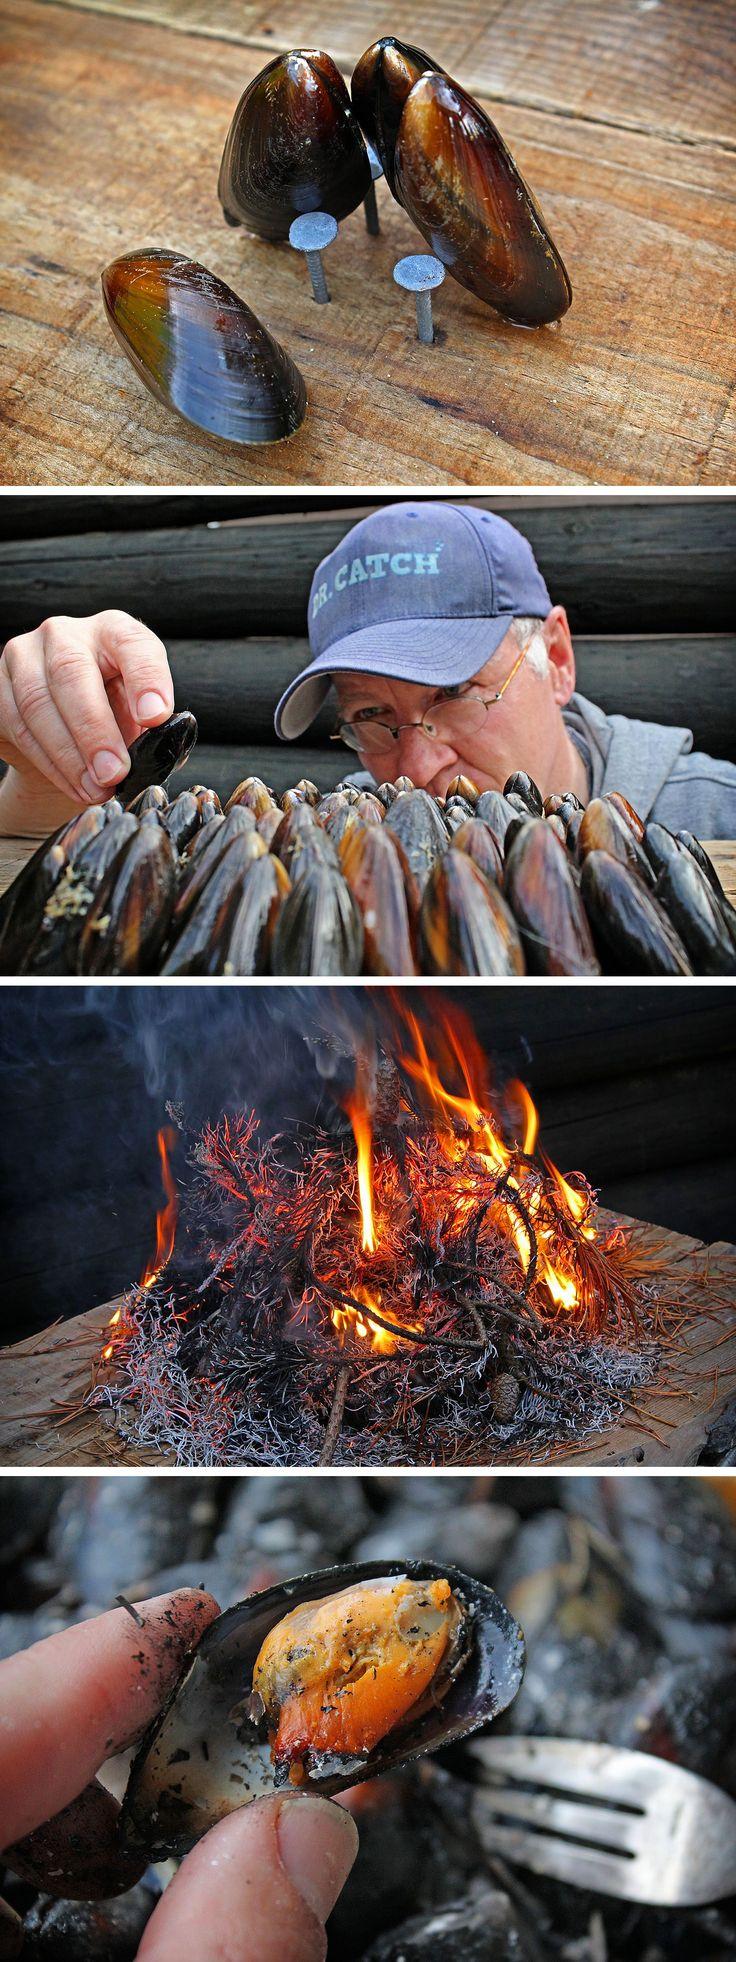 Eclade de moules - Muscheln auf Kiefernadeln zubereiten   Cooking mussels on pine needles